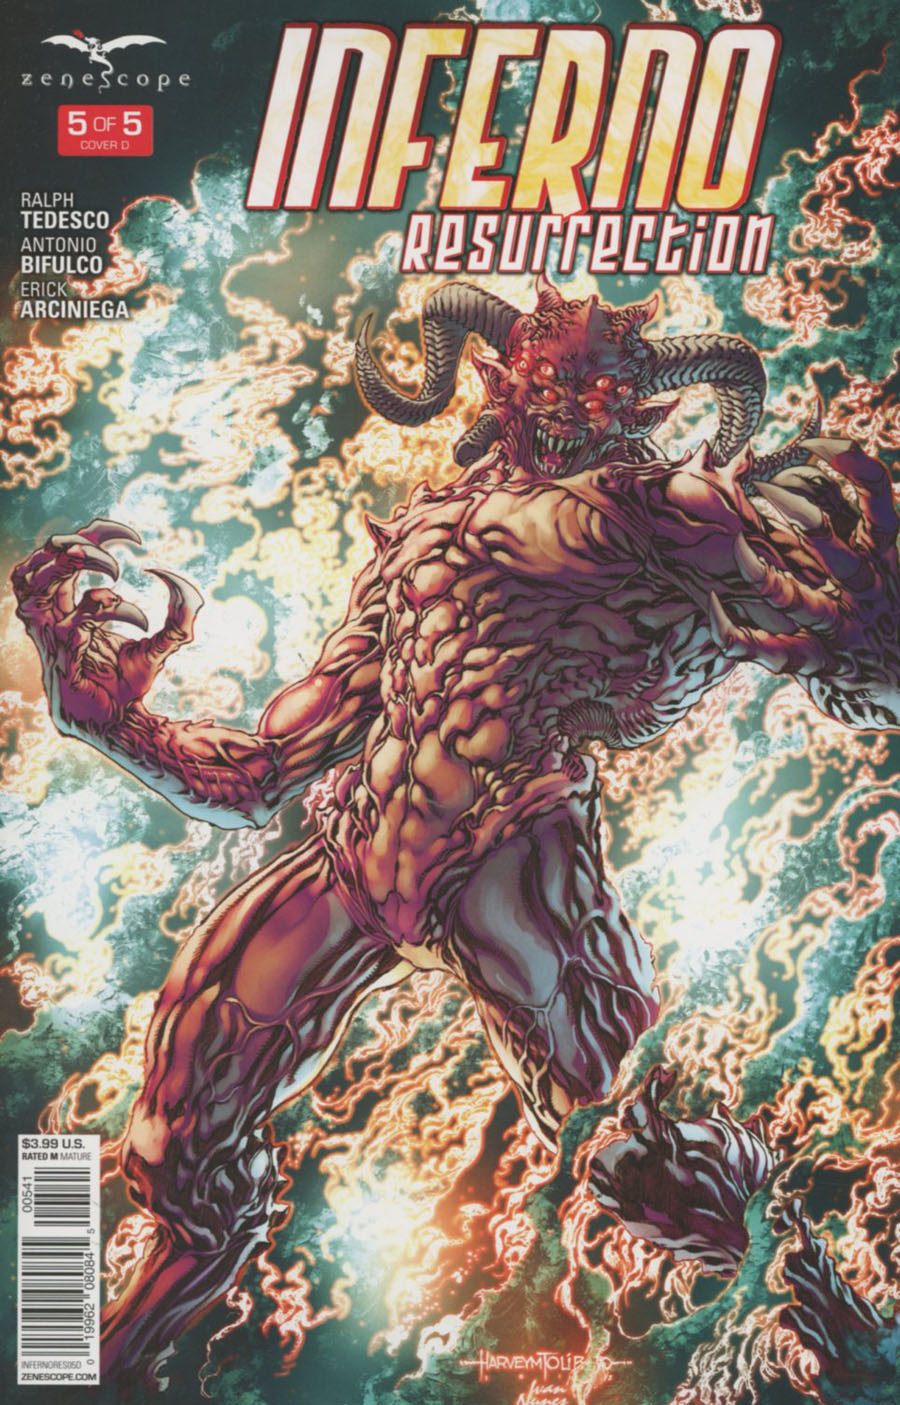 Grimm Fairy Tales Presents Inferno Resurrection #5 Cover D Harvey Tolibao